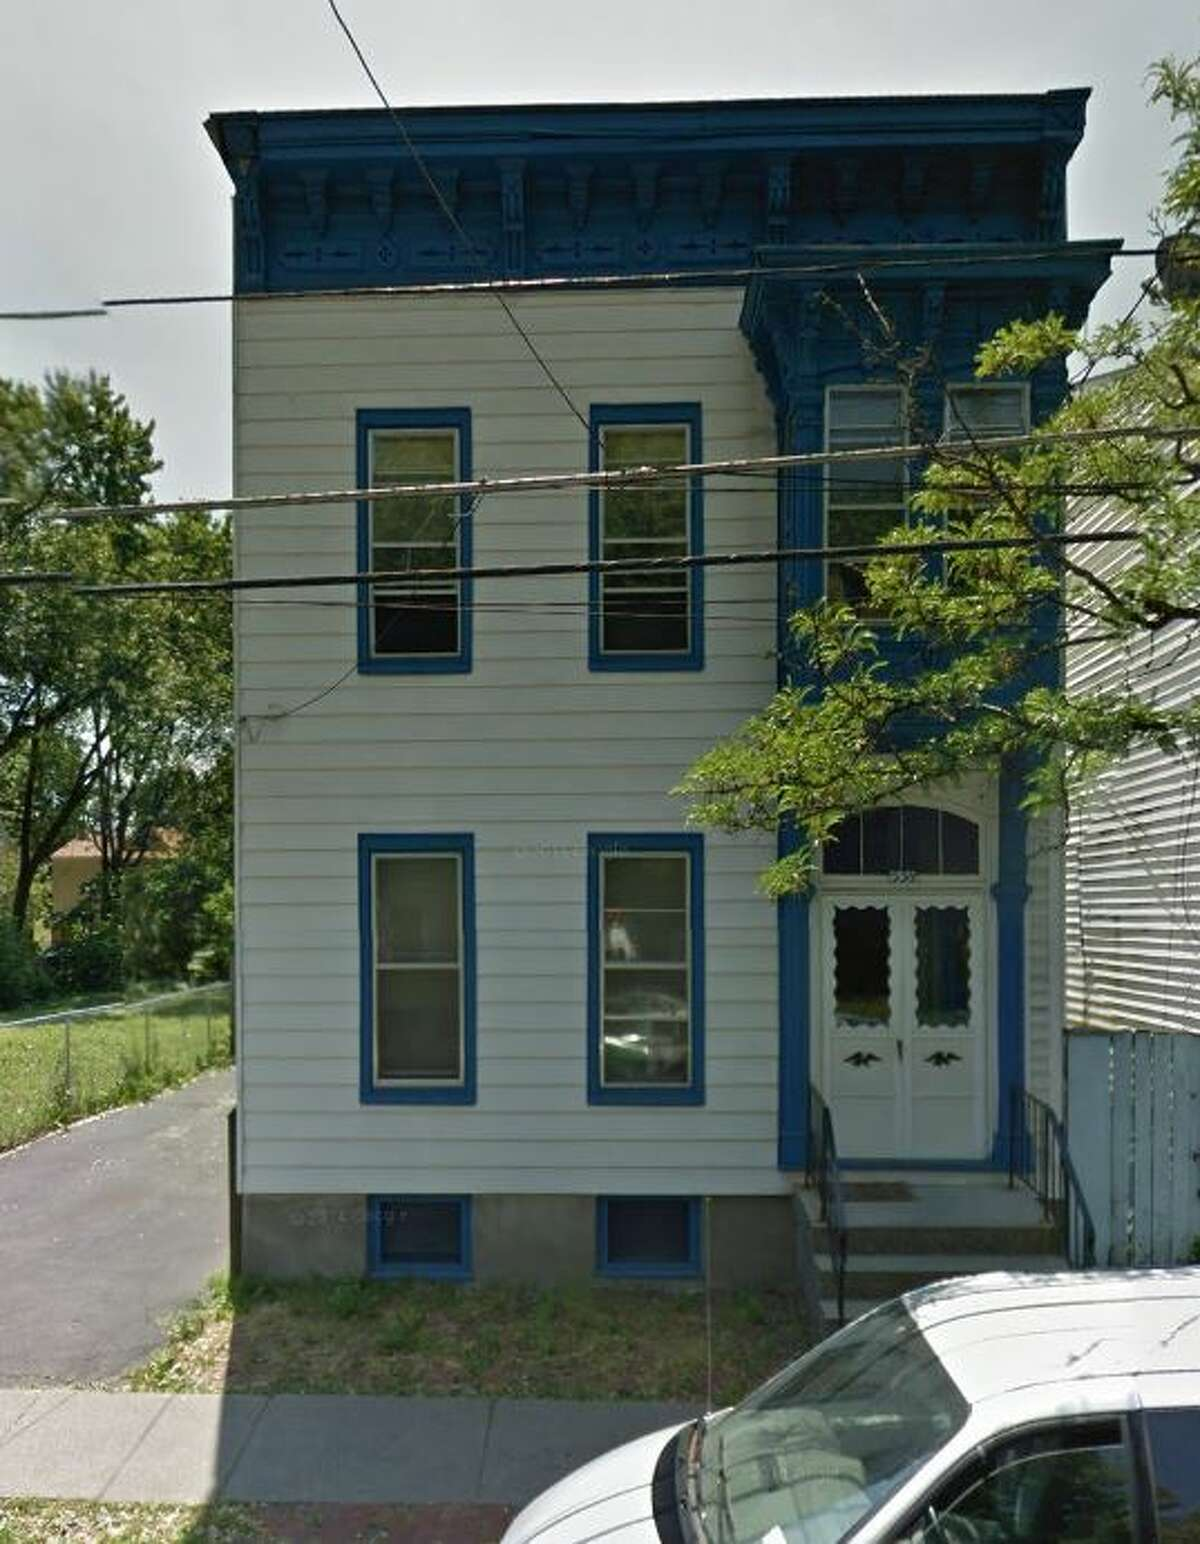 538 Third St., Albany, $15,000 (Google Maps)